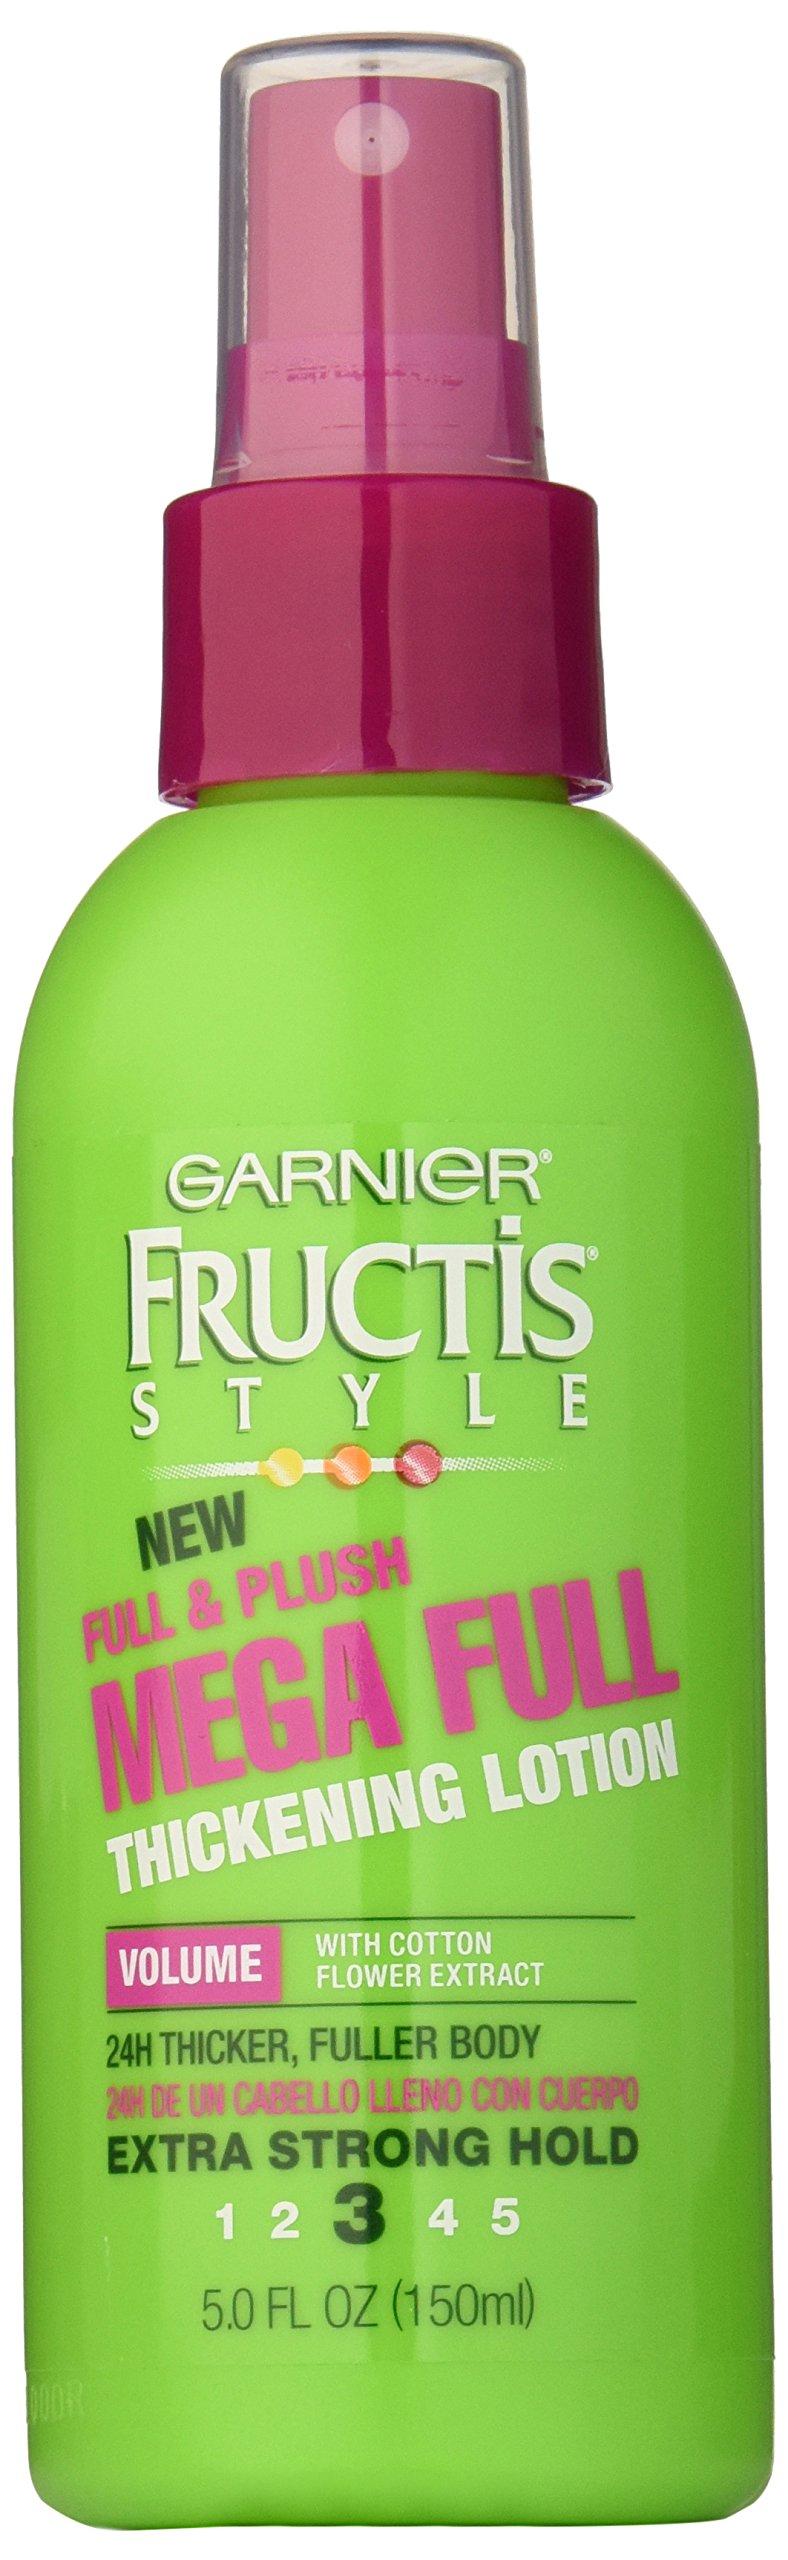 Garnier Hair Care Fructis Style Full and Plush Mega Full Thickening Lotion, 5 Fluid Ounce